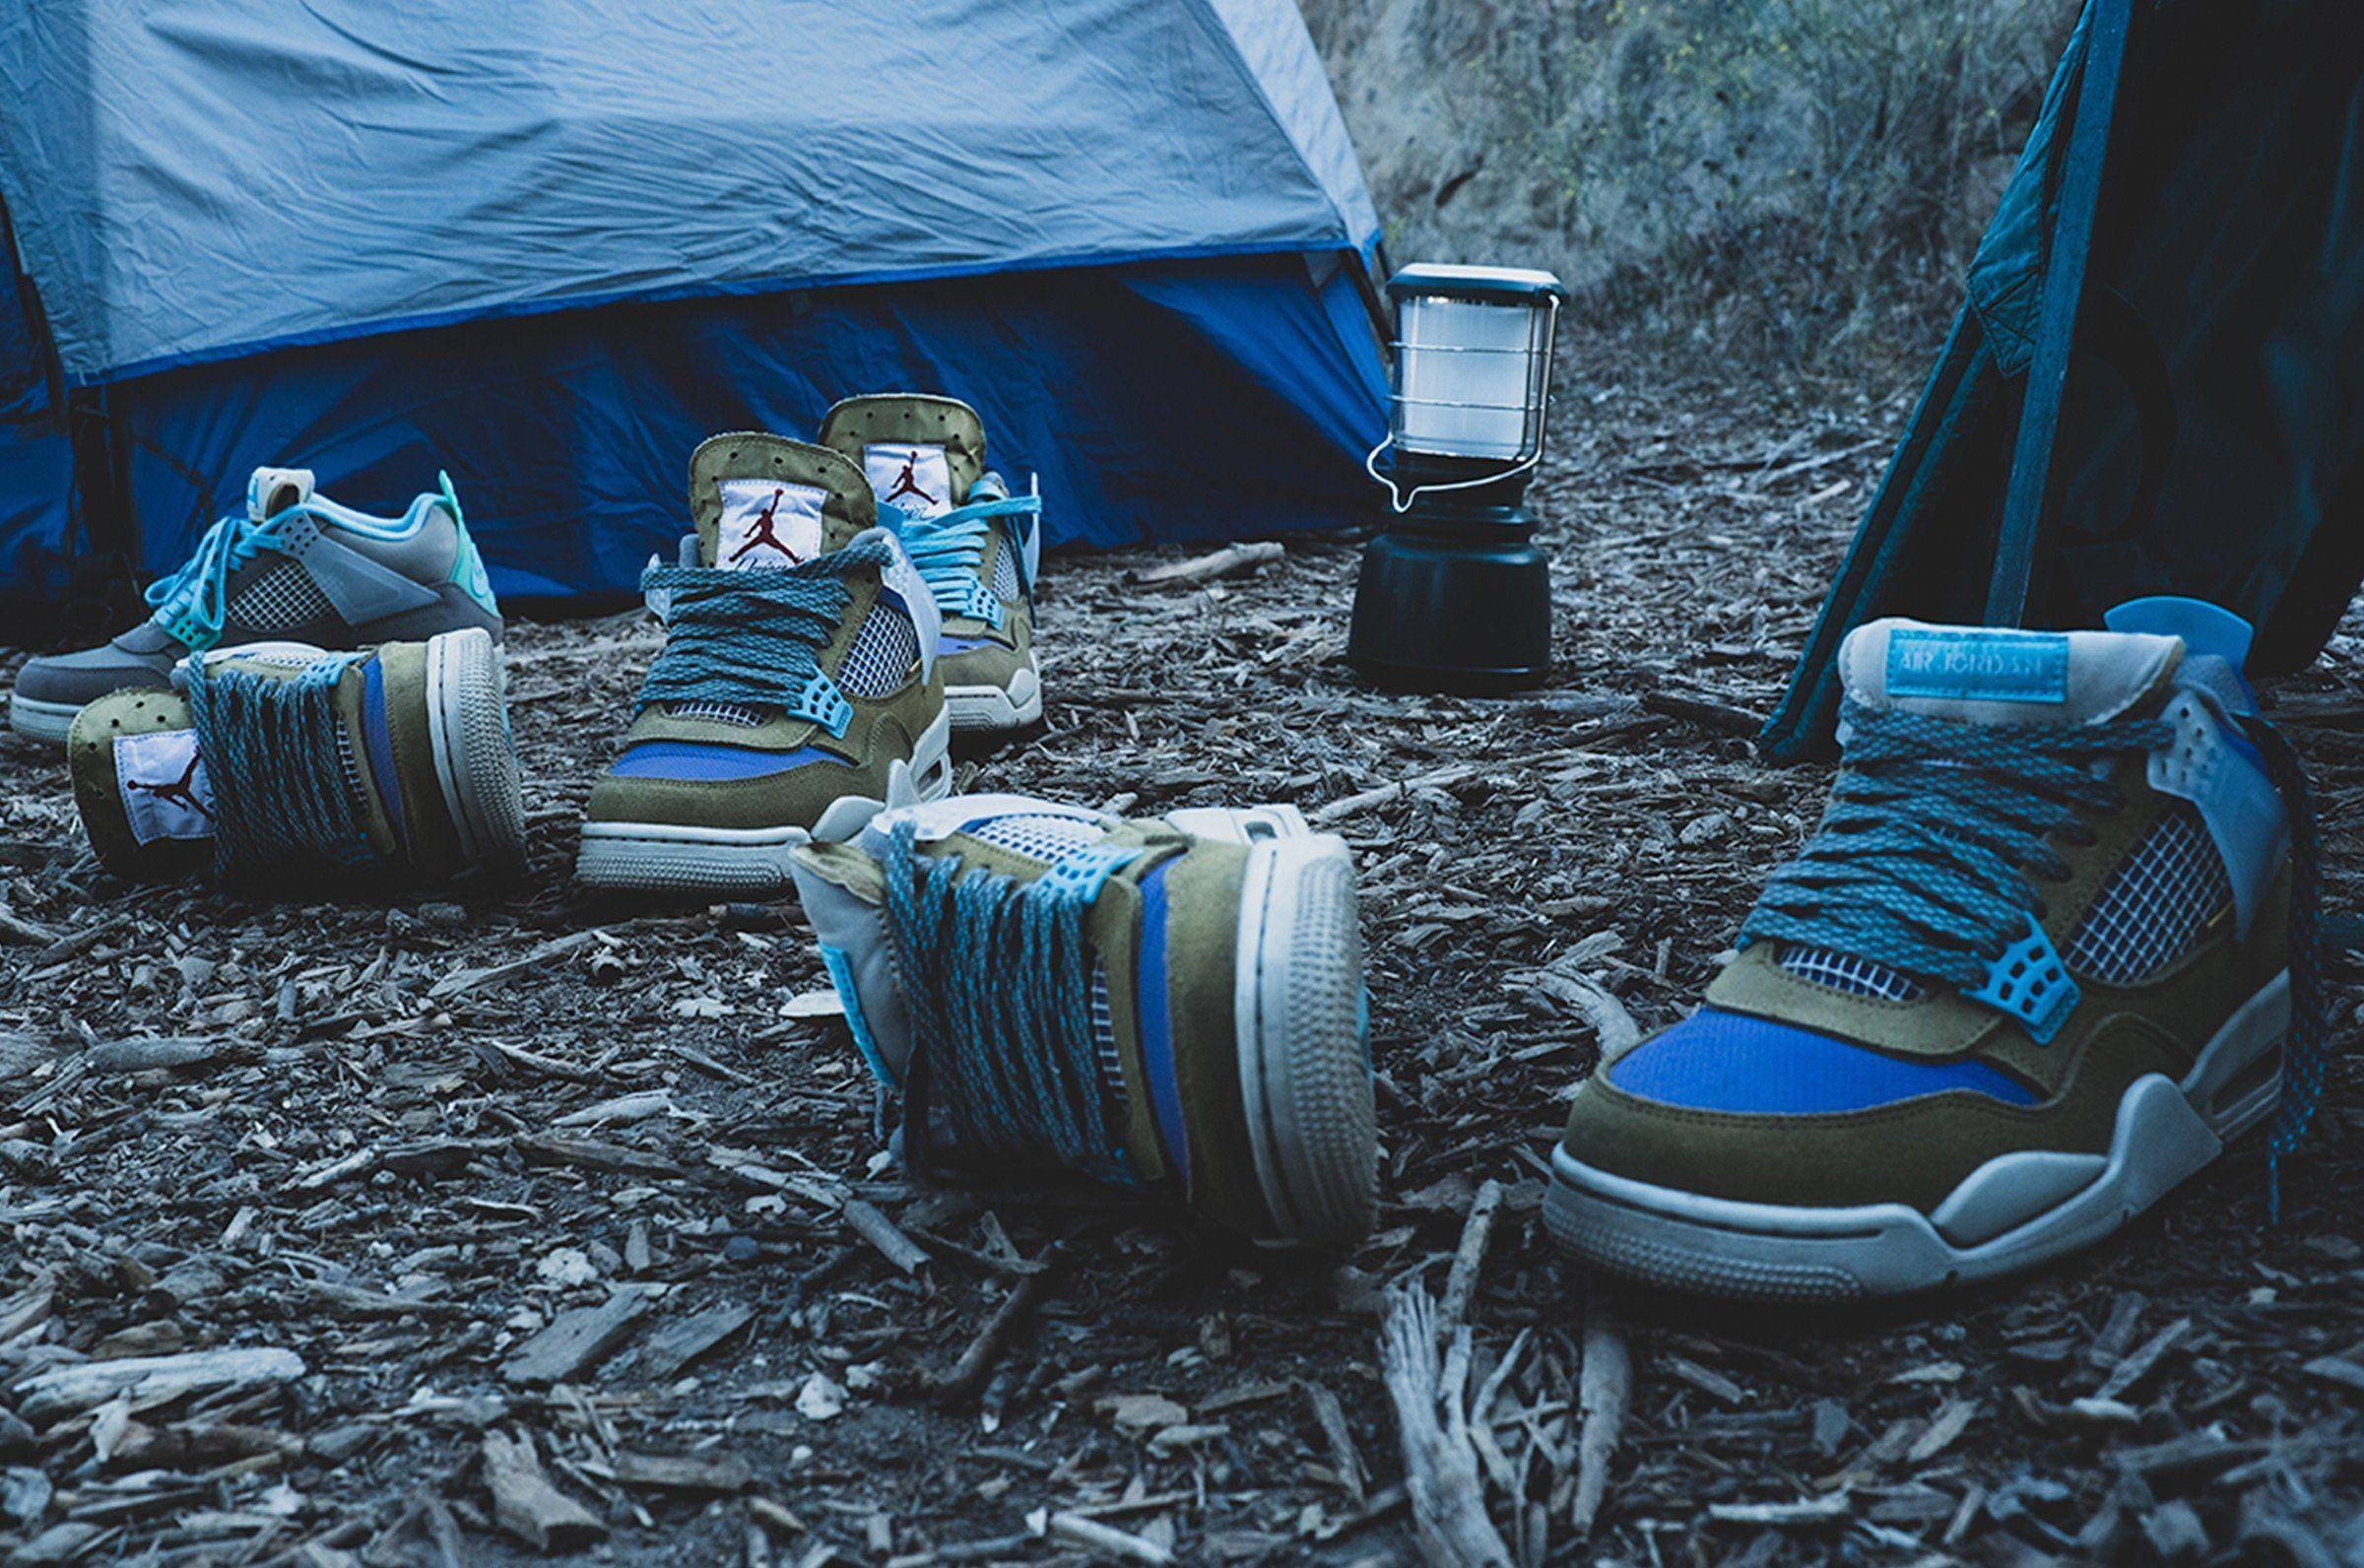 Union x Air Jordan 4 Tent and Trail